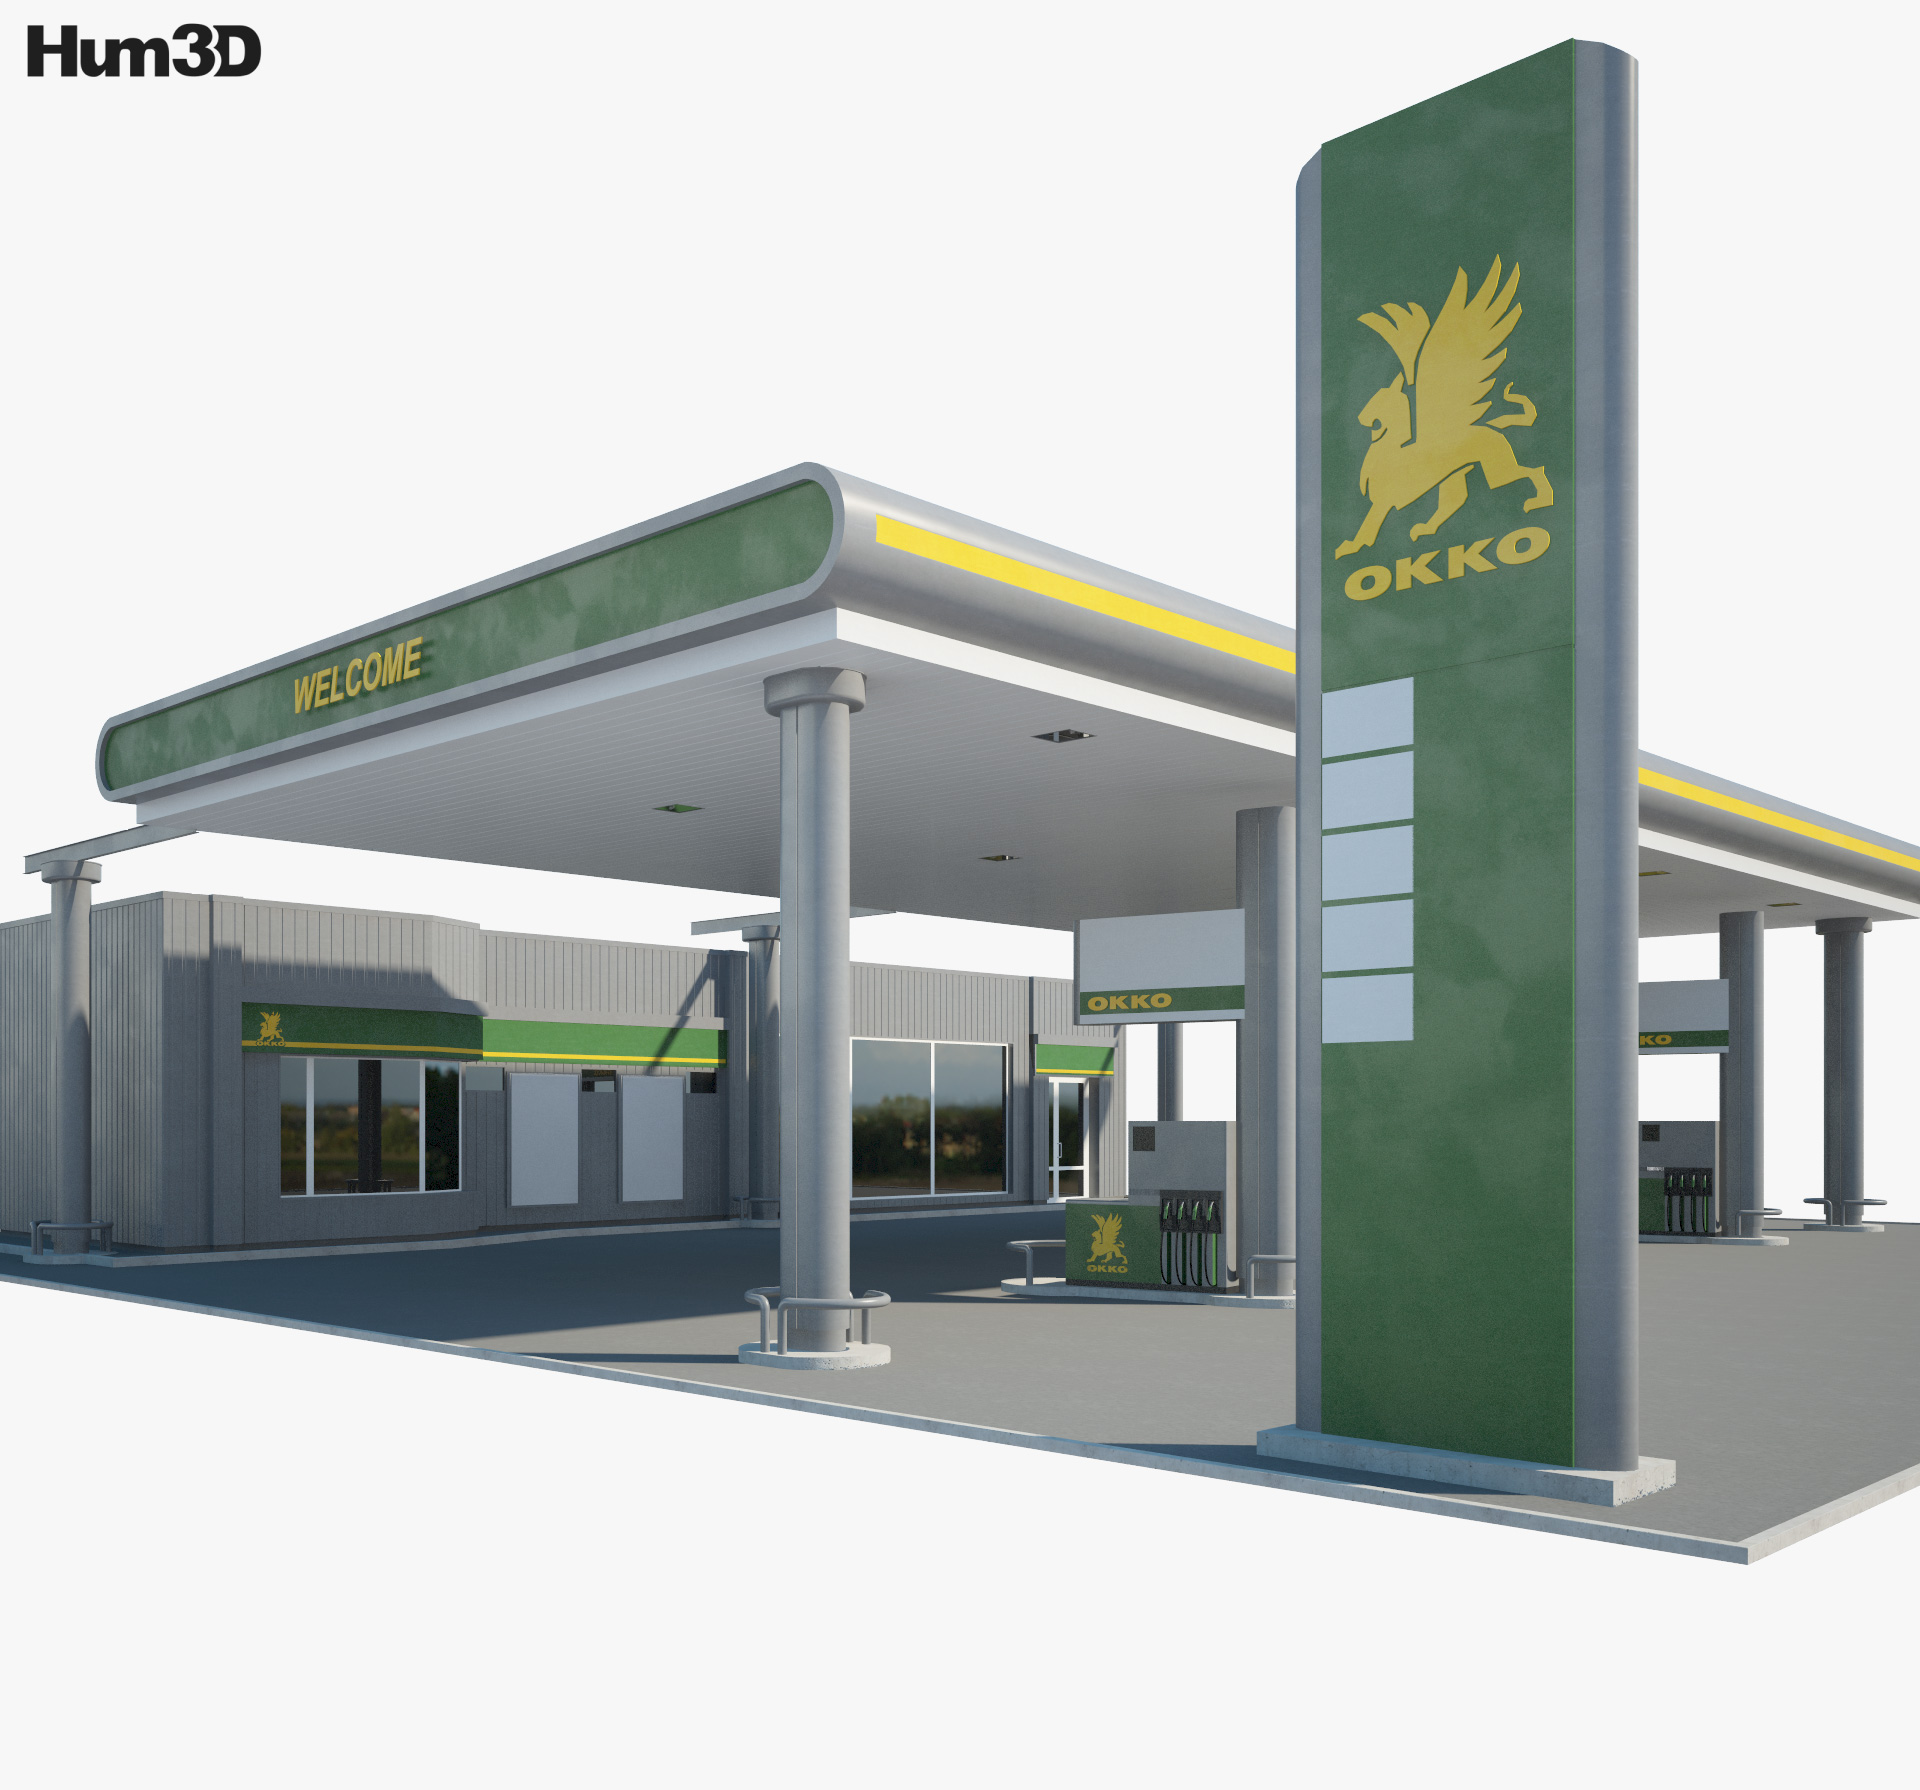 OKKO gas station 001 3d model